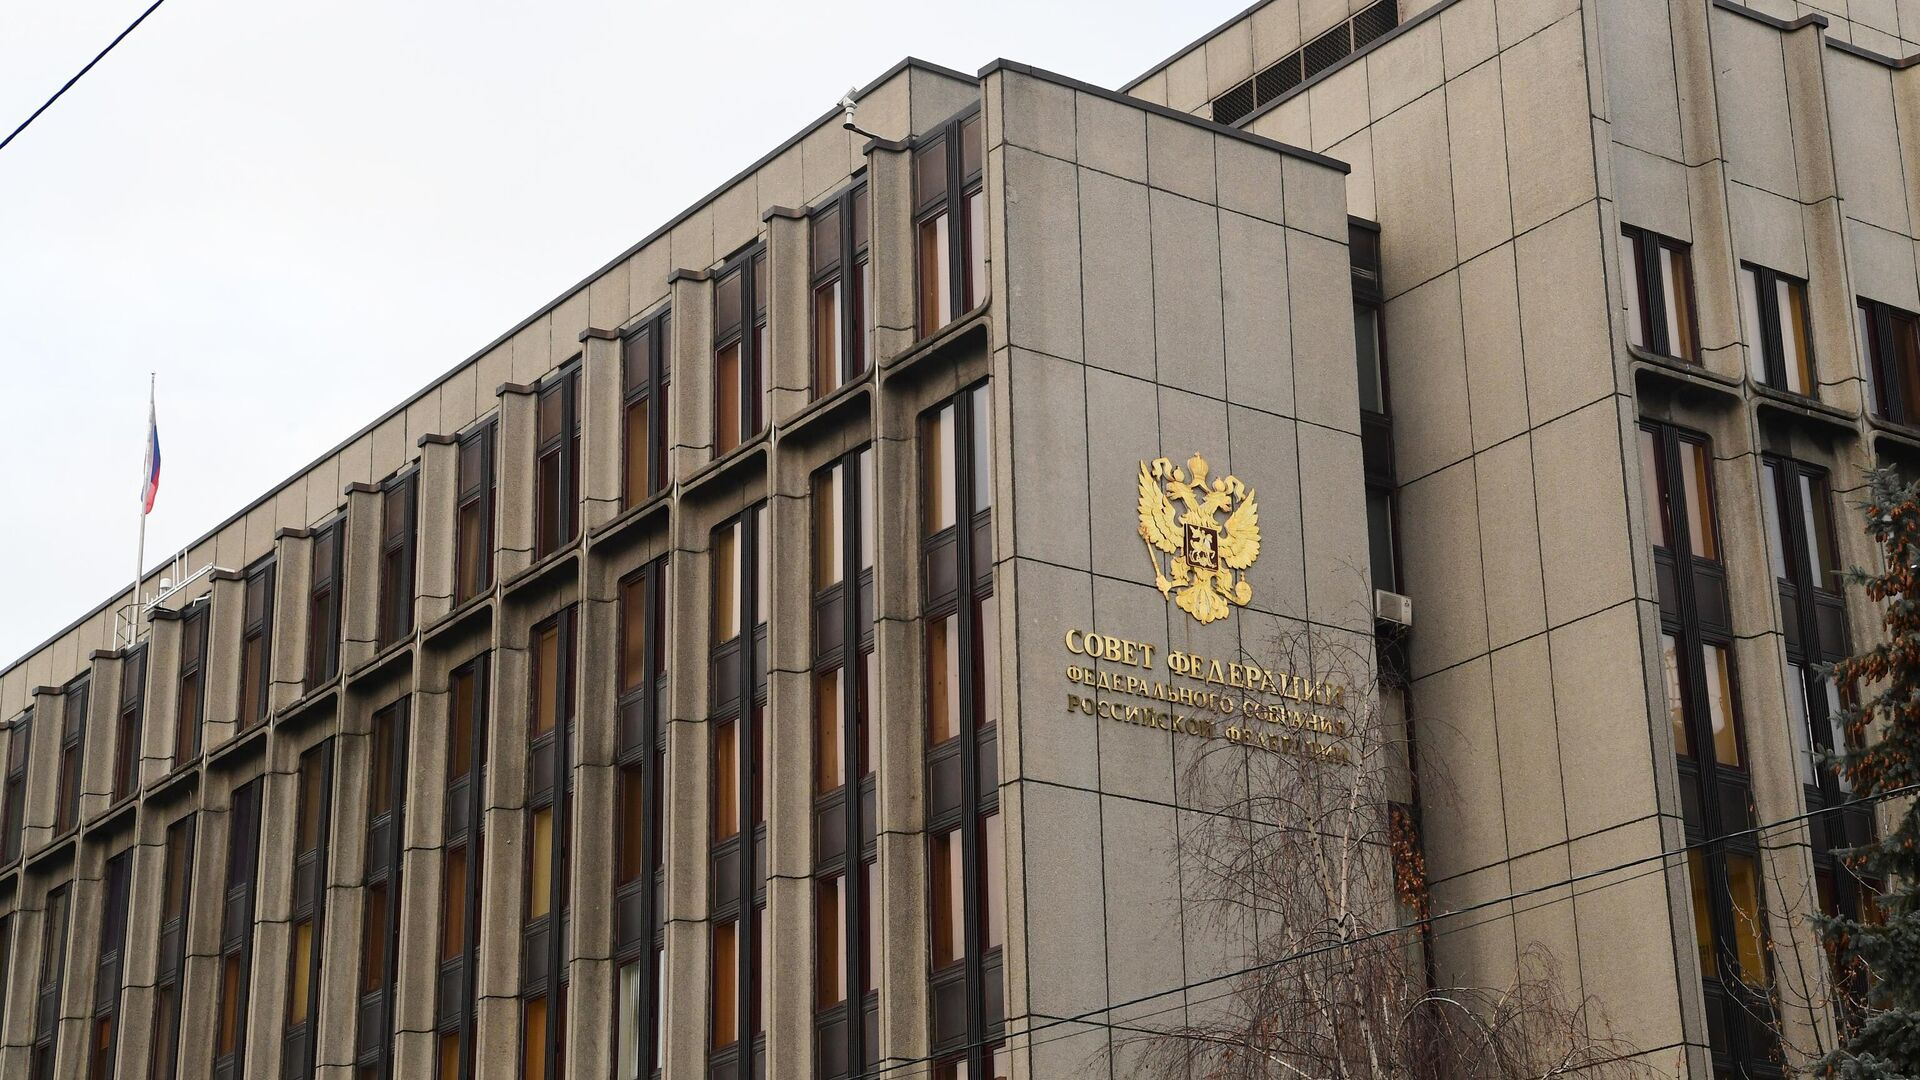 Здание Совета Федерации РФ в Москве - РИА Новости, 1920, 03.03.2021